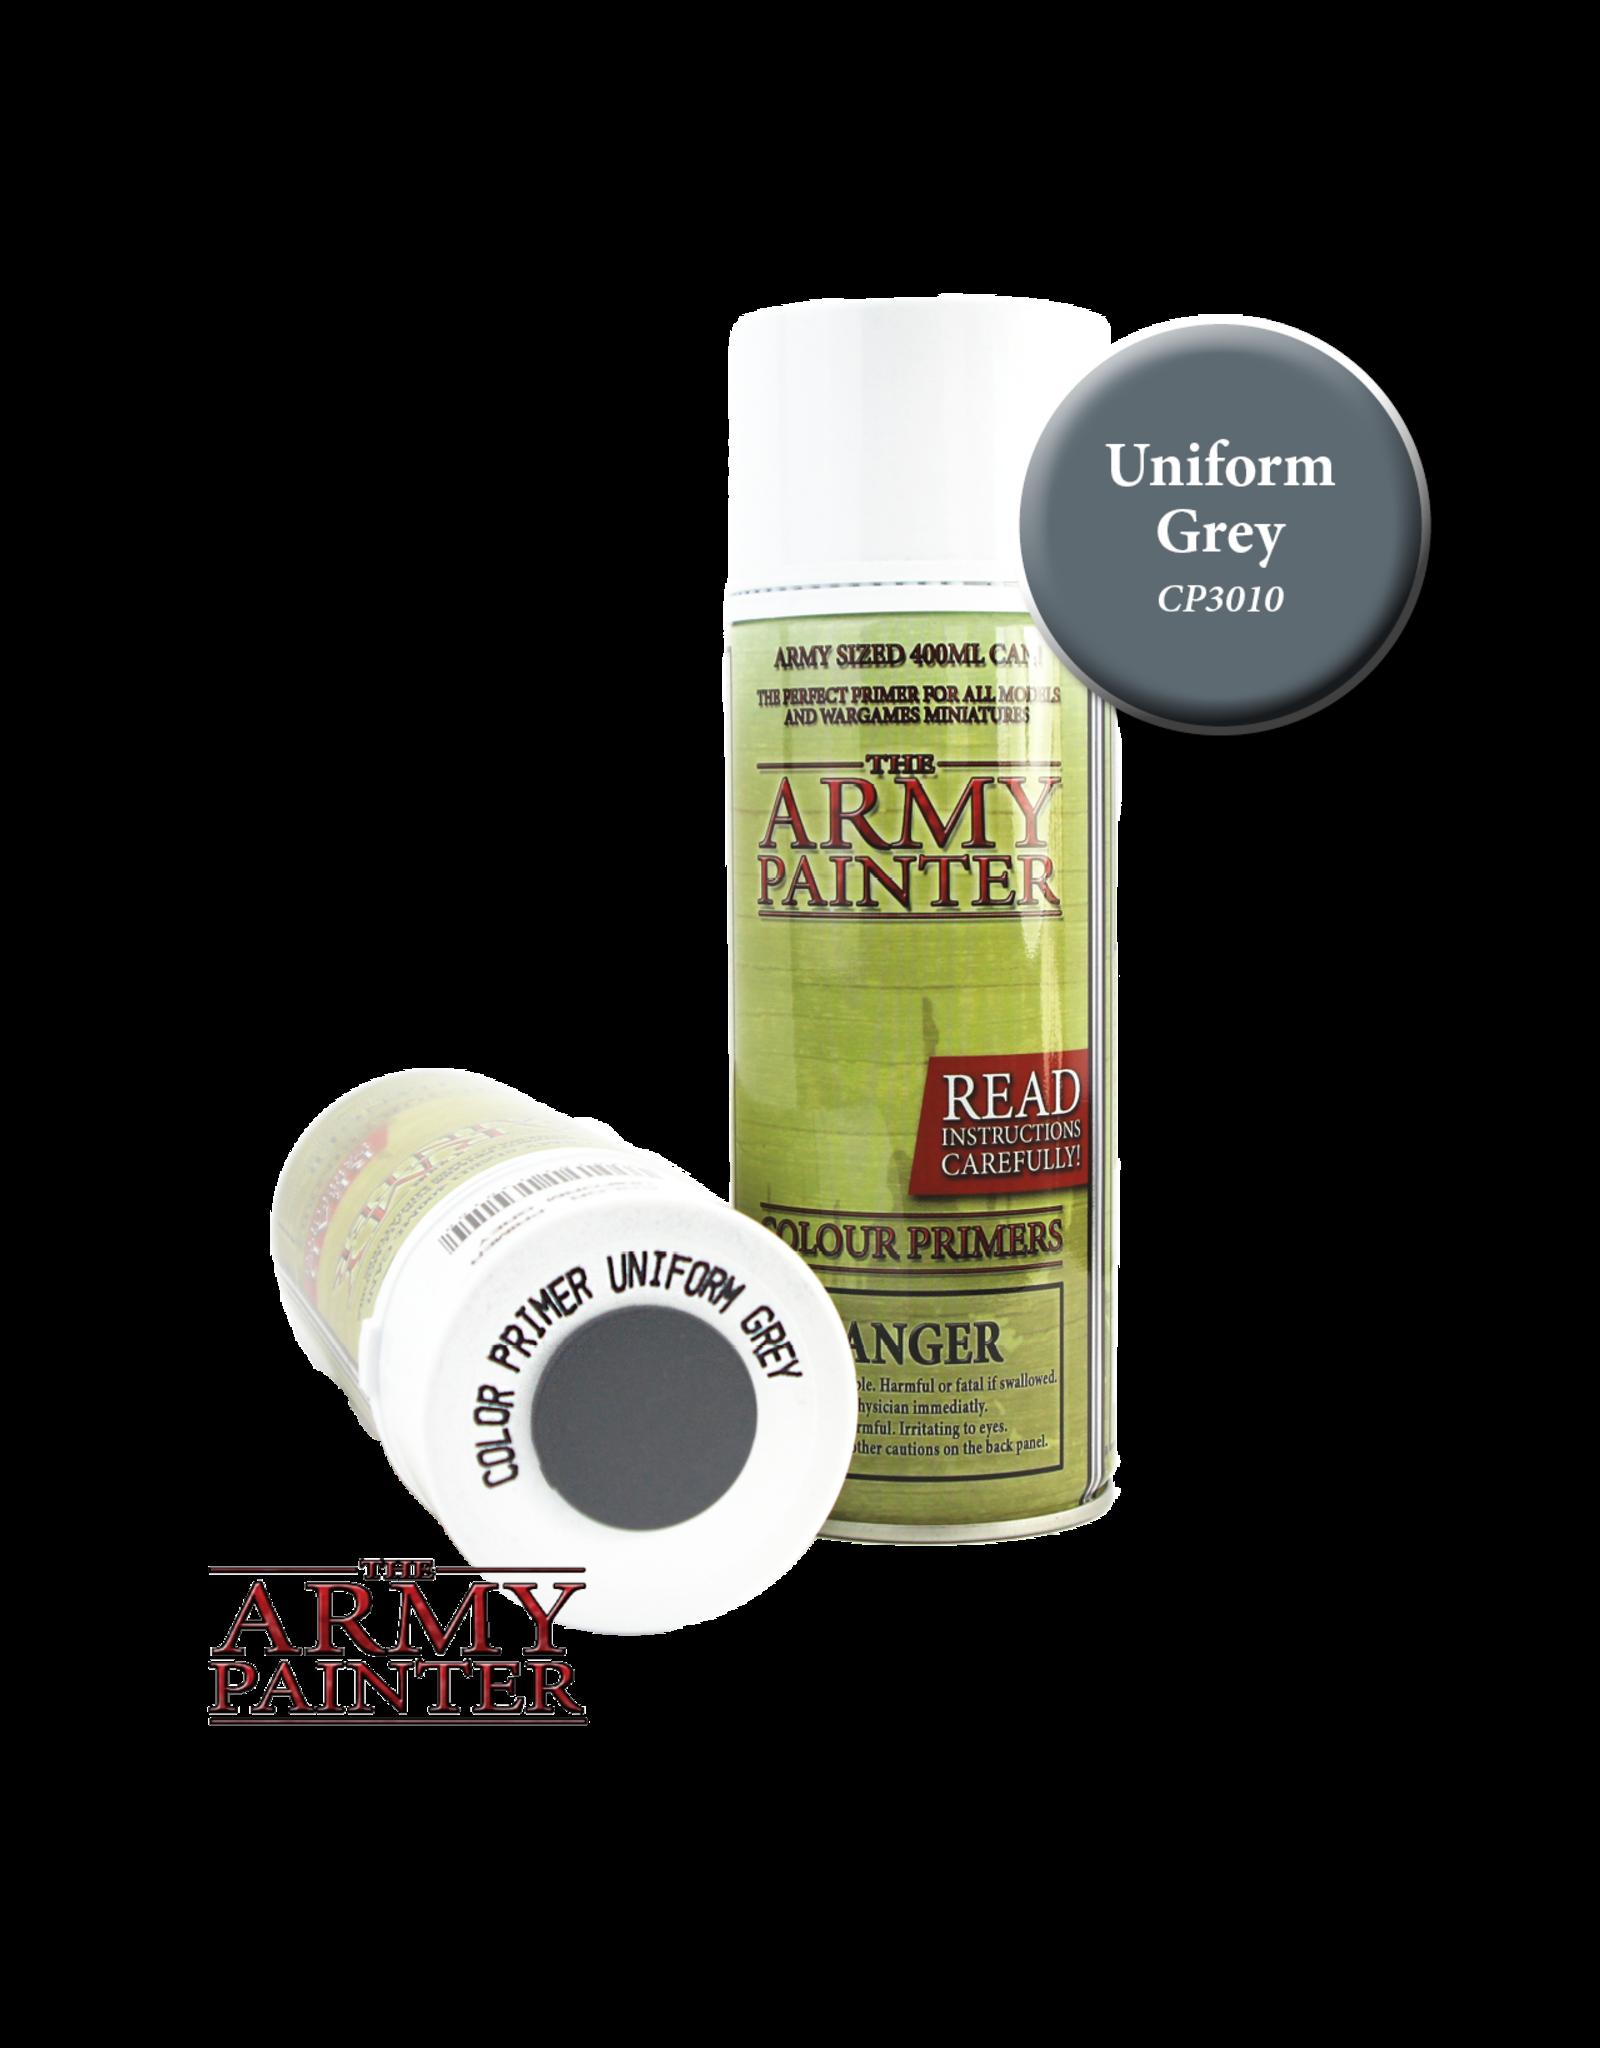 THE ARMY PAINTER ARMY PAINTER COLOR PRIMER UNIFORM GREY